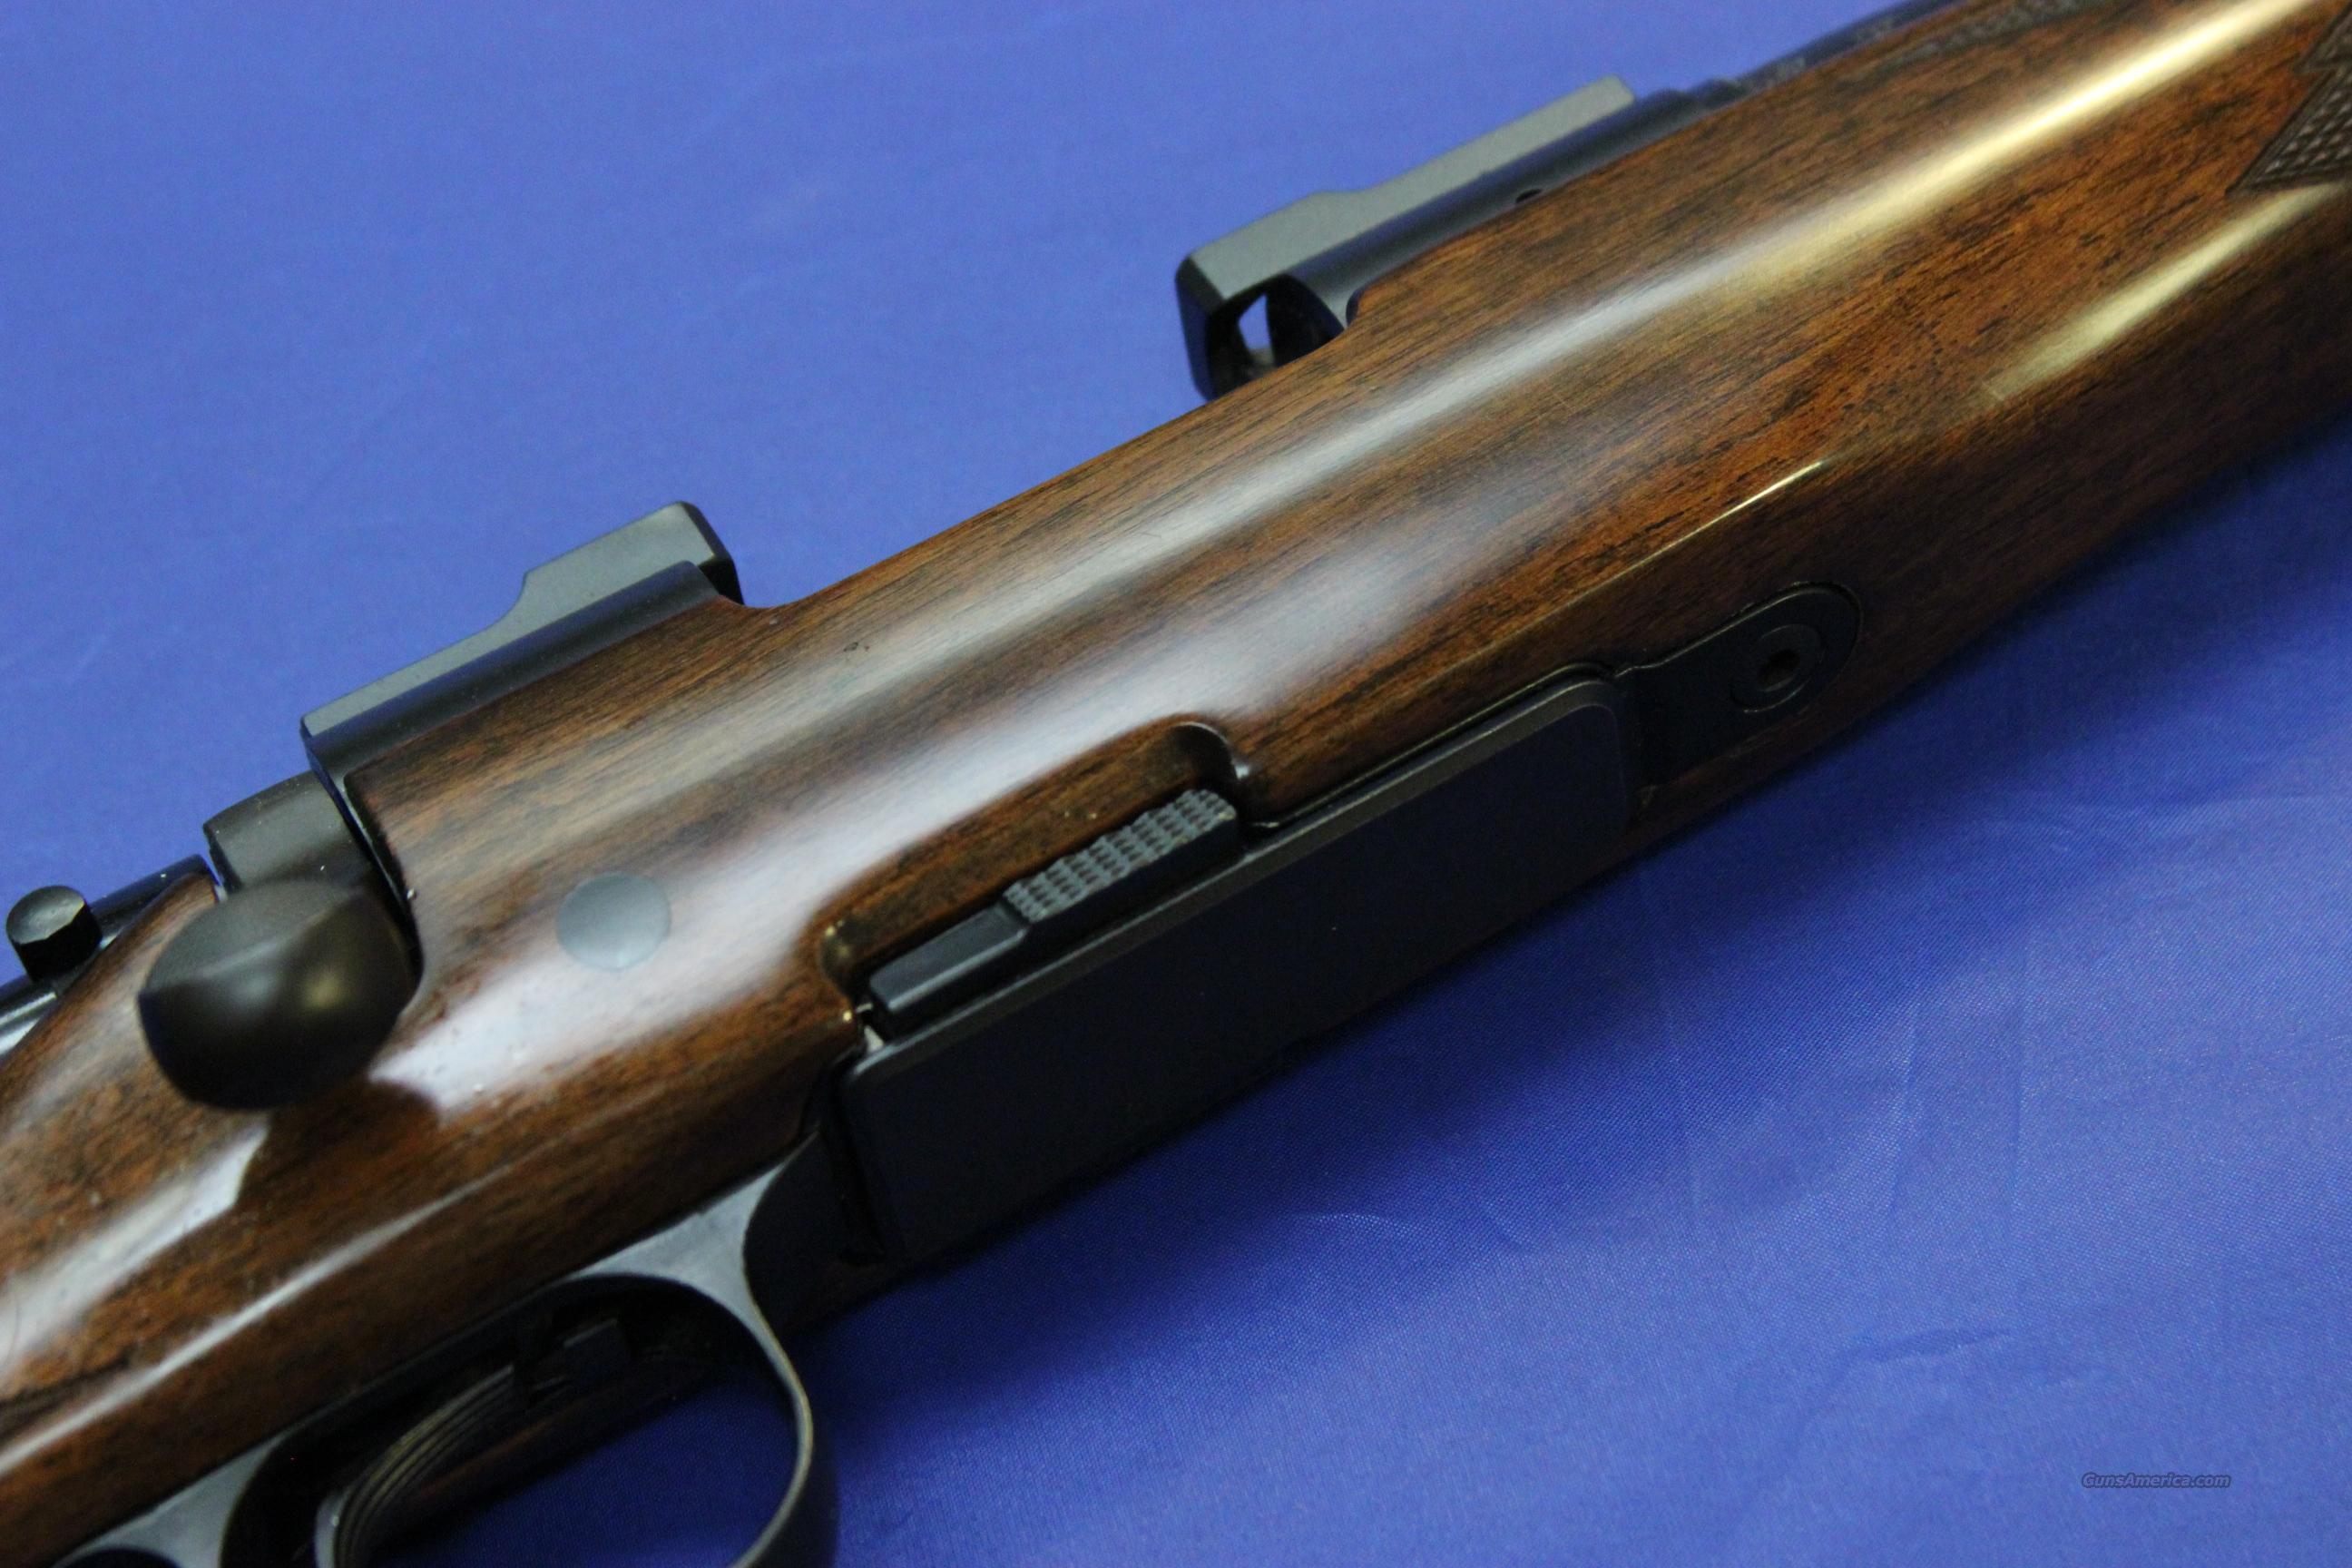 7mm-08 Rem 700 Related Keywords & Suggestions - 7mm-08 Rem 700 Long